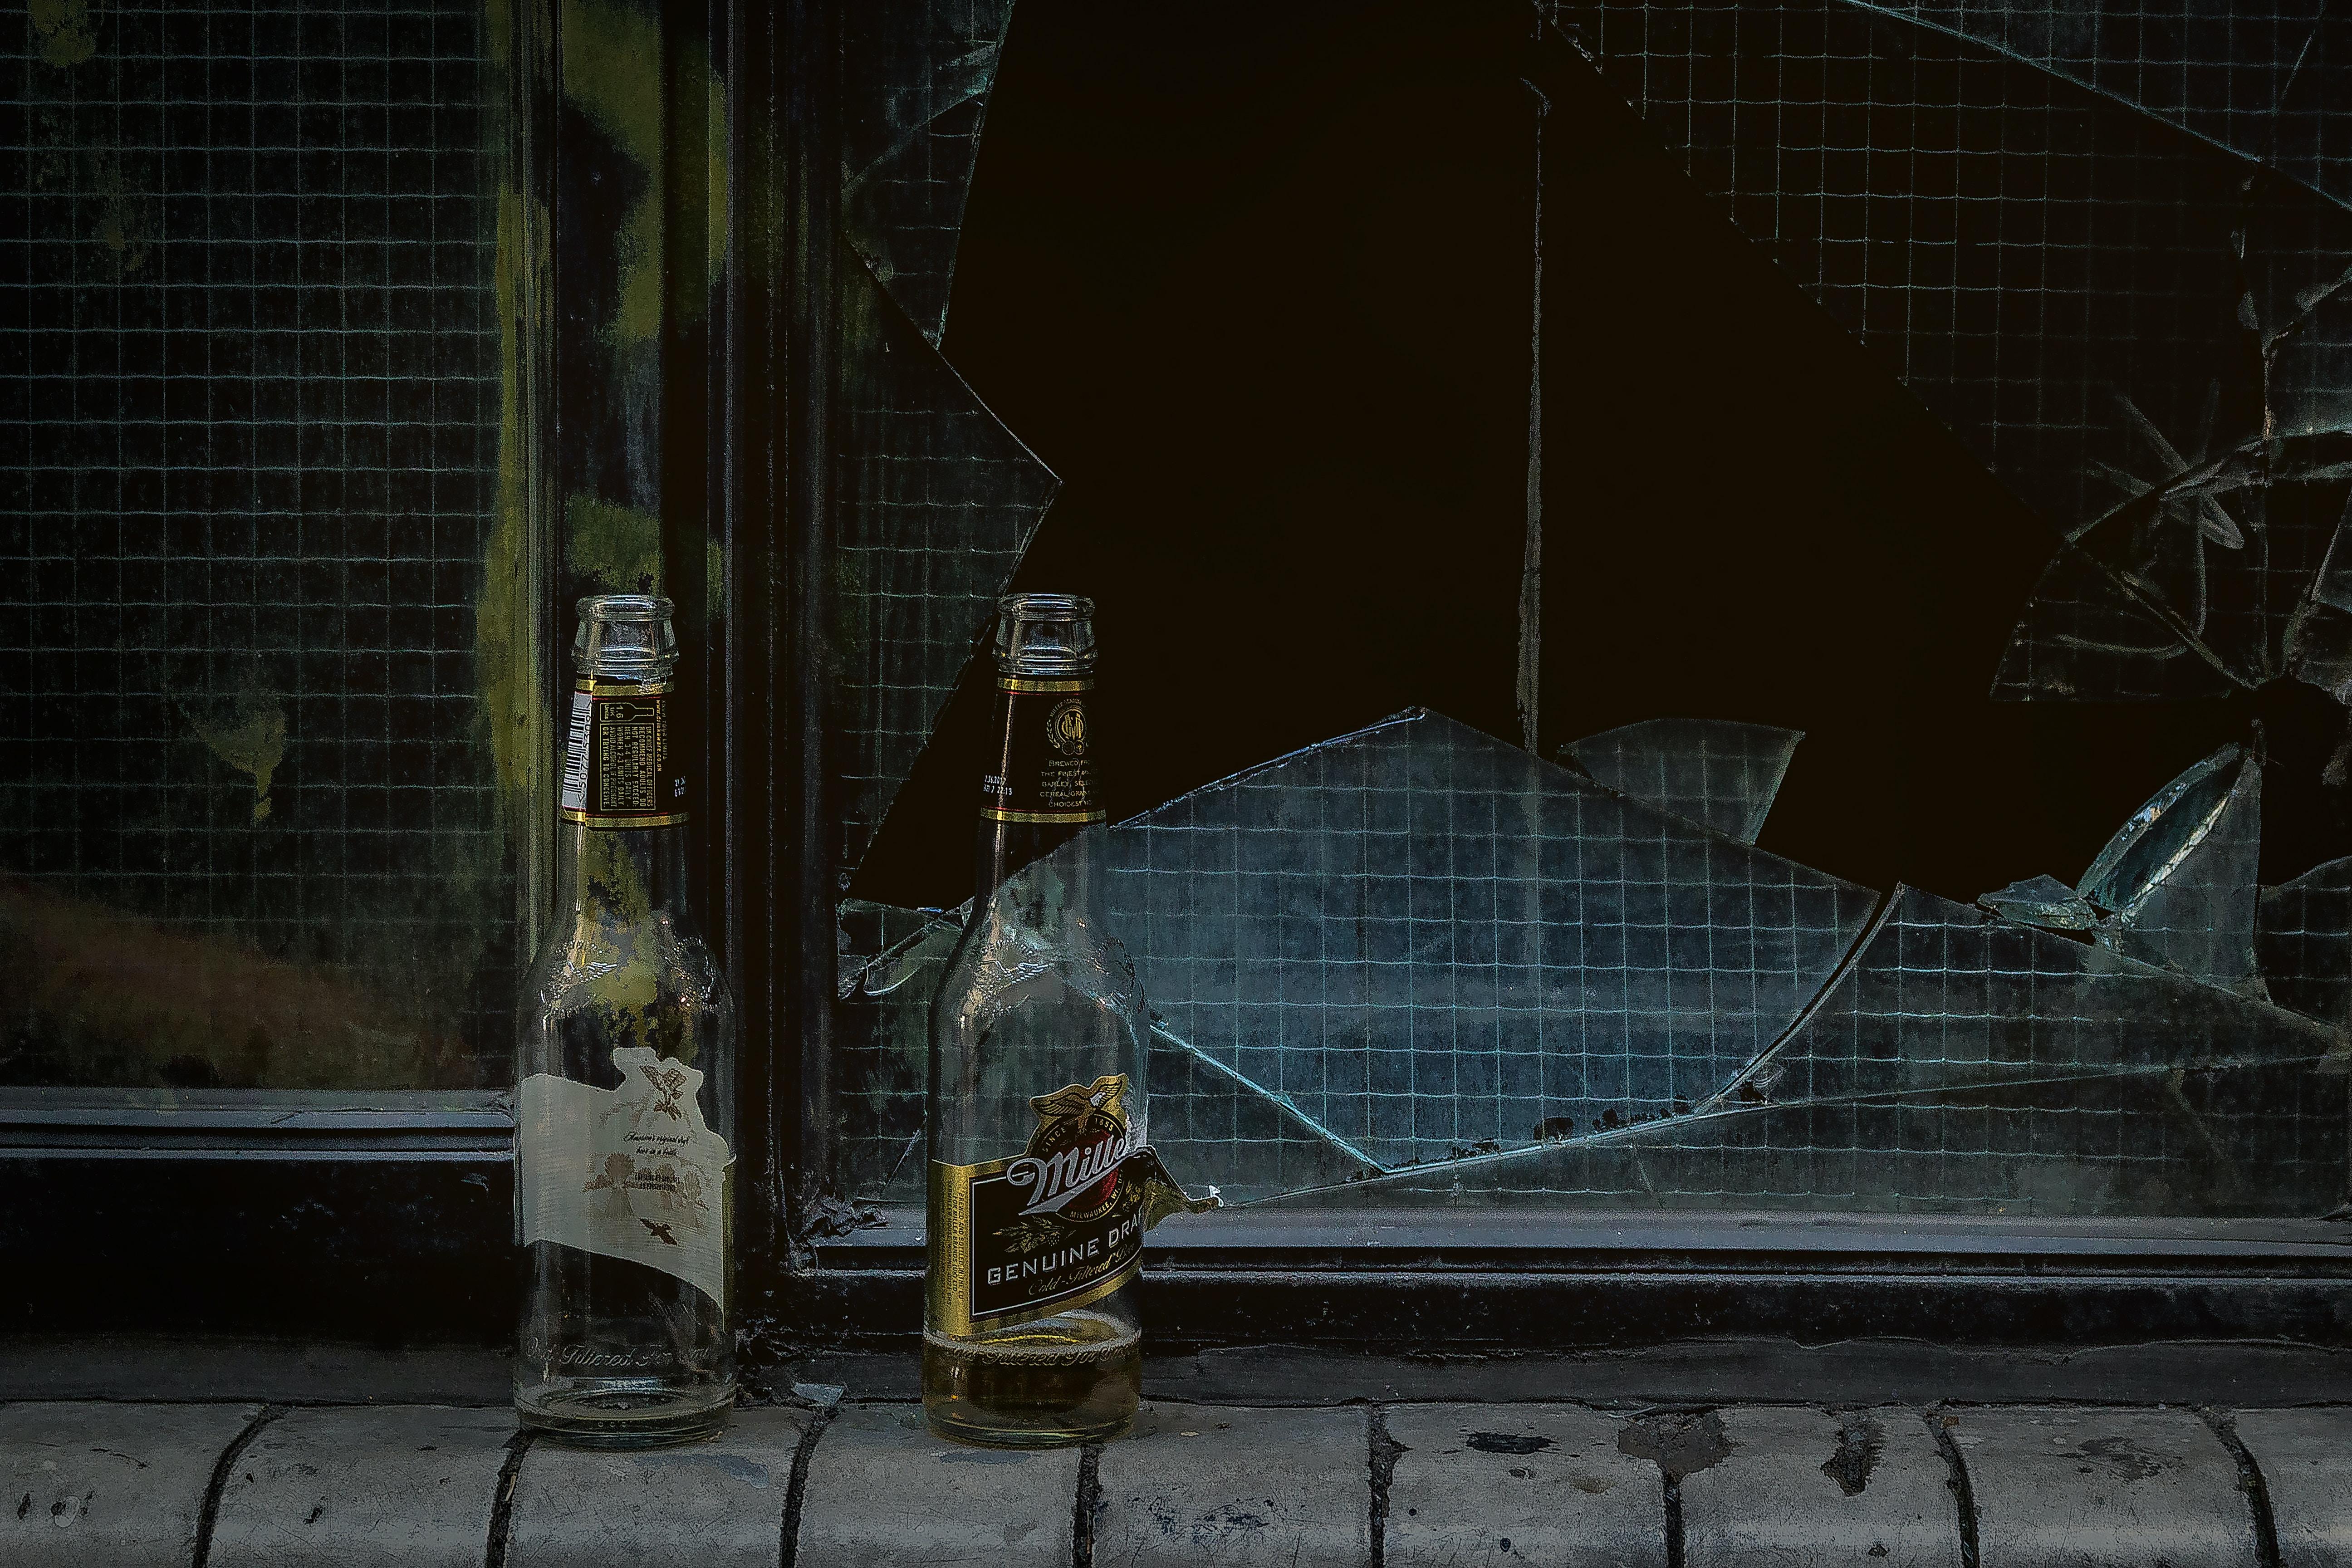 Two beer bottles in front of a broken glass window